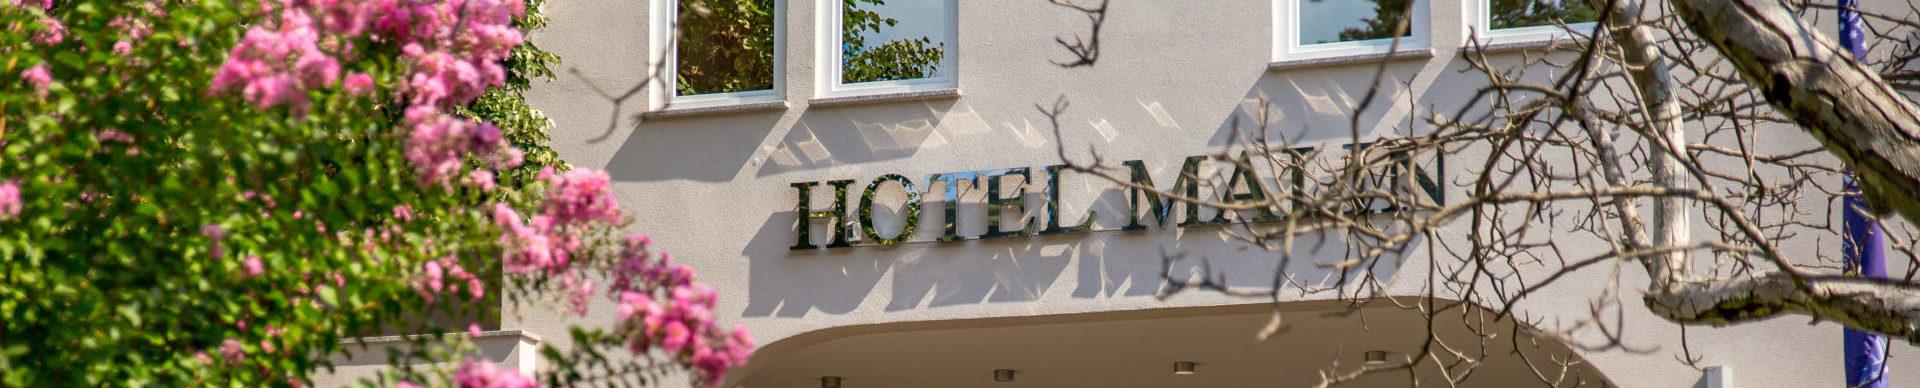 Ponuda Hotela Malin Krk